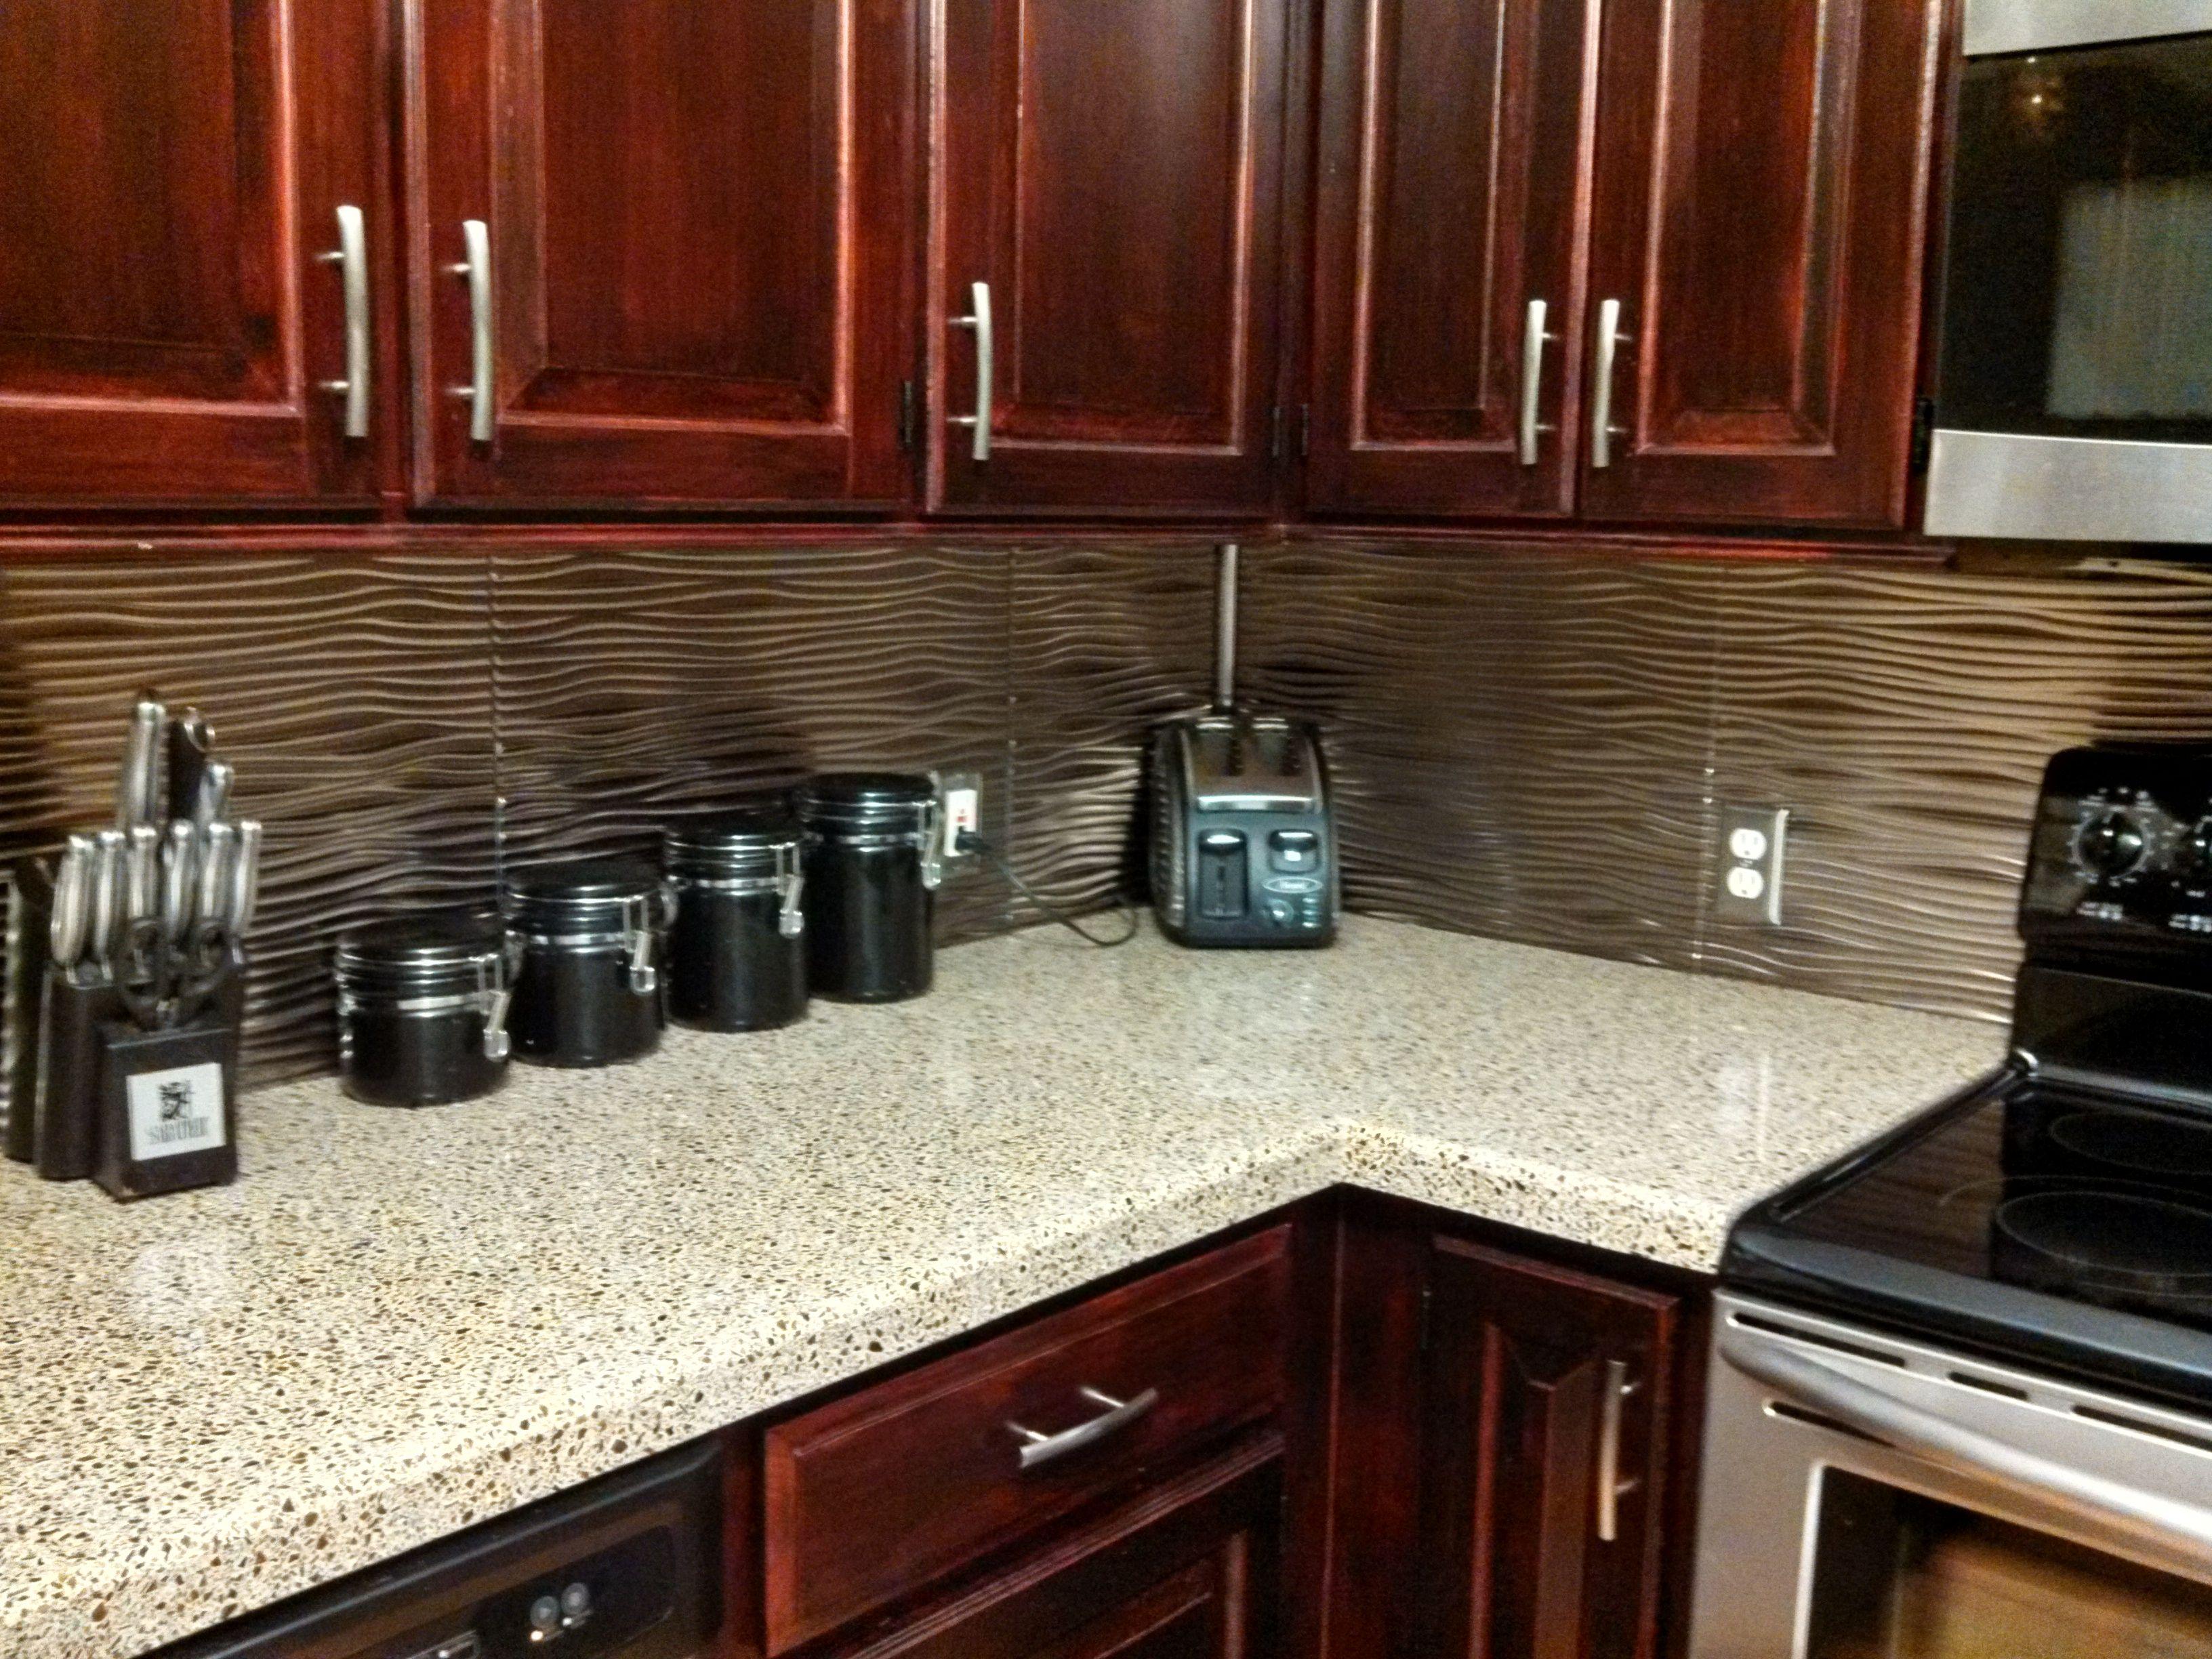 Fasade Backsplash - Waves in Brushed Nickel | Kitchens, Kitchen ...